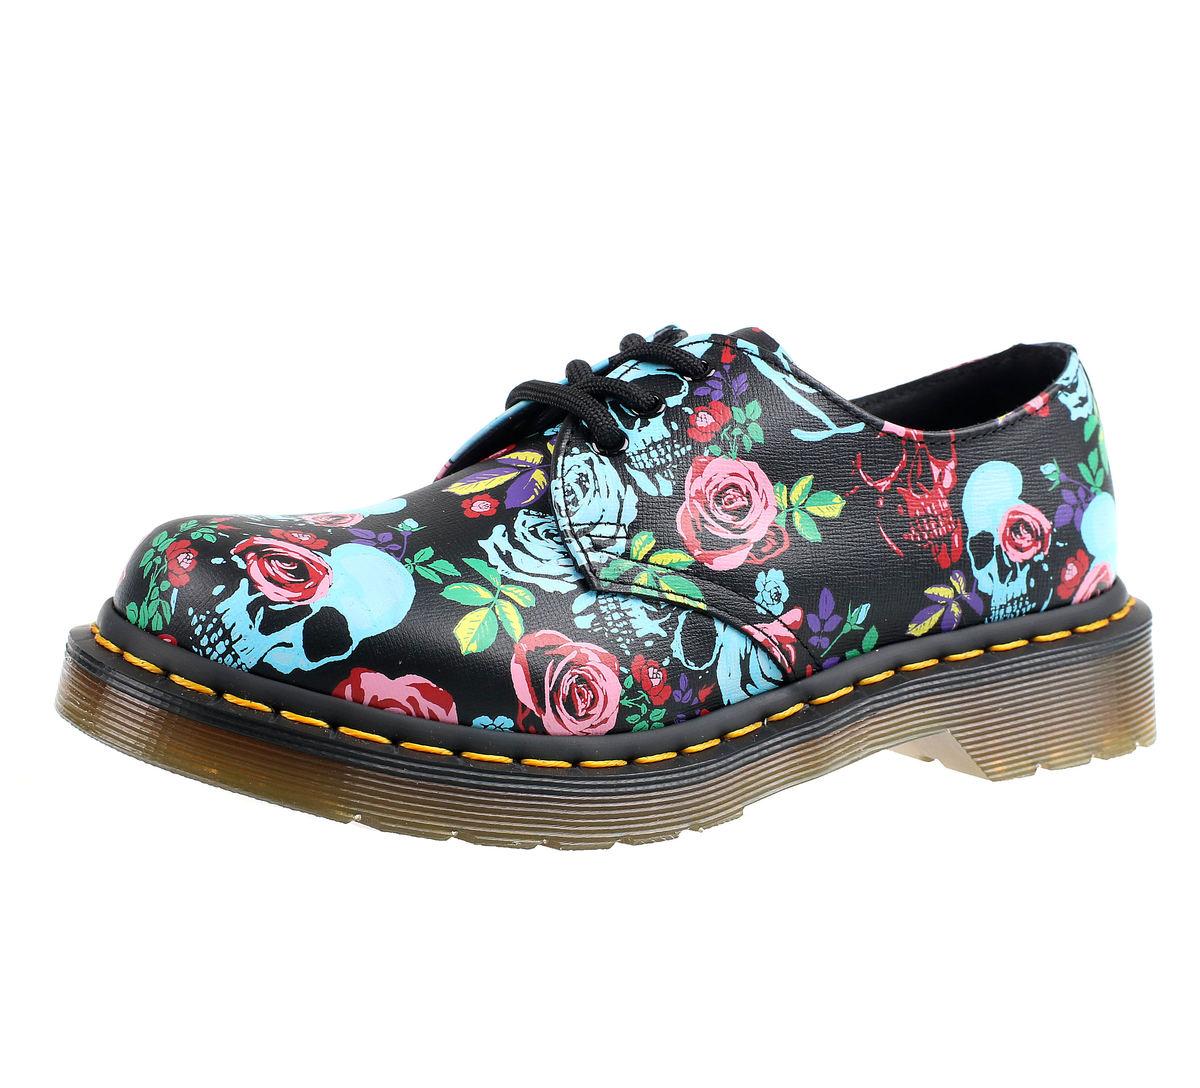 36db0036d16f5 topánky DR.MARTENS - 3 dierkové - ROSE MULTI - DM24428102